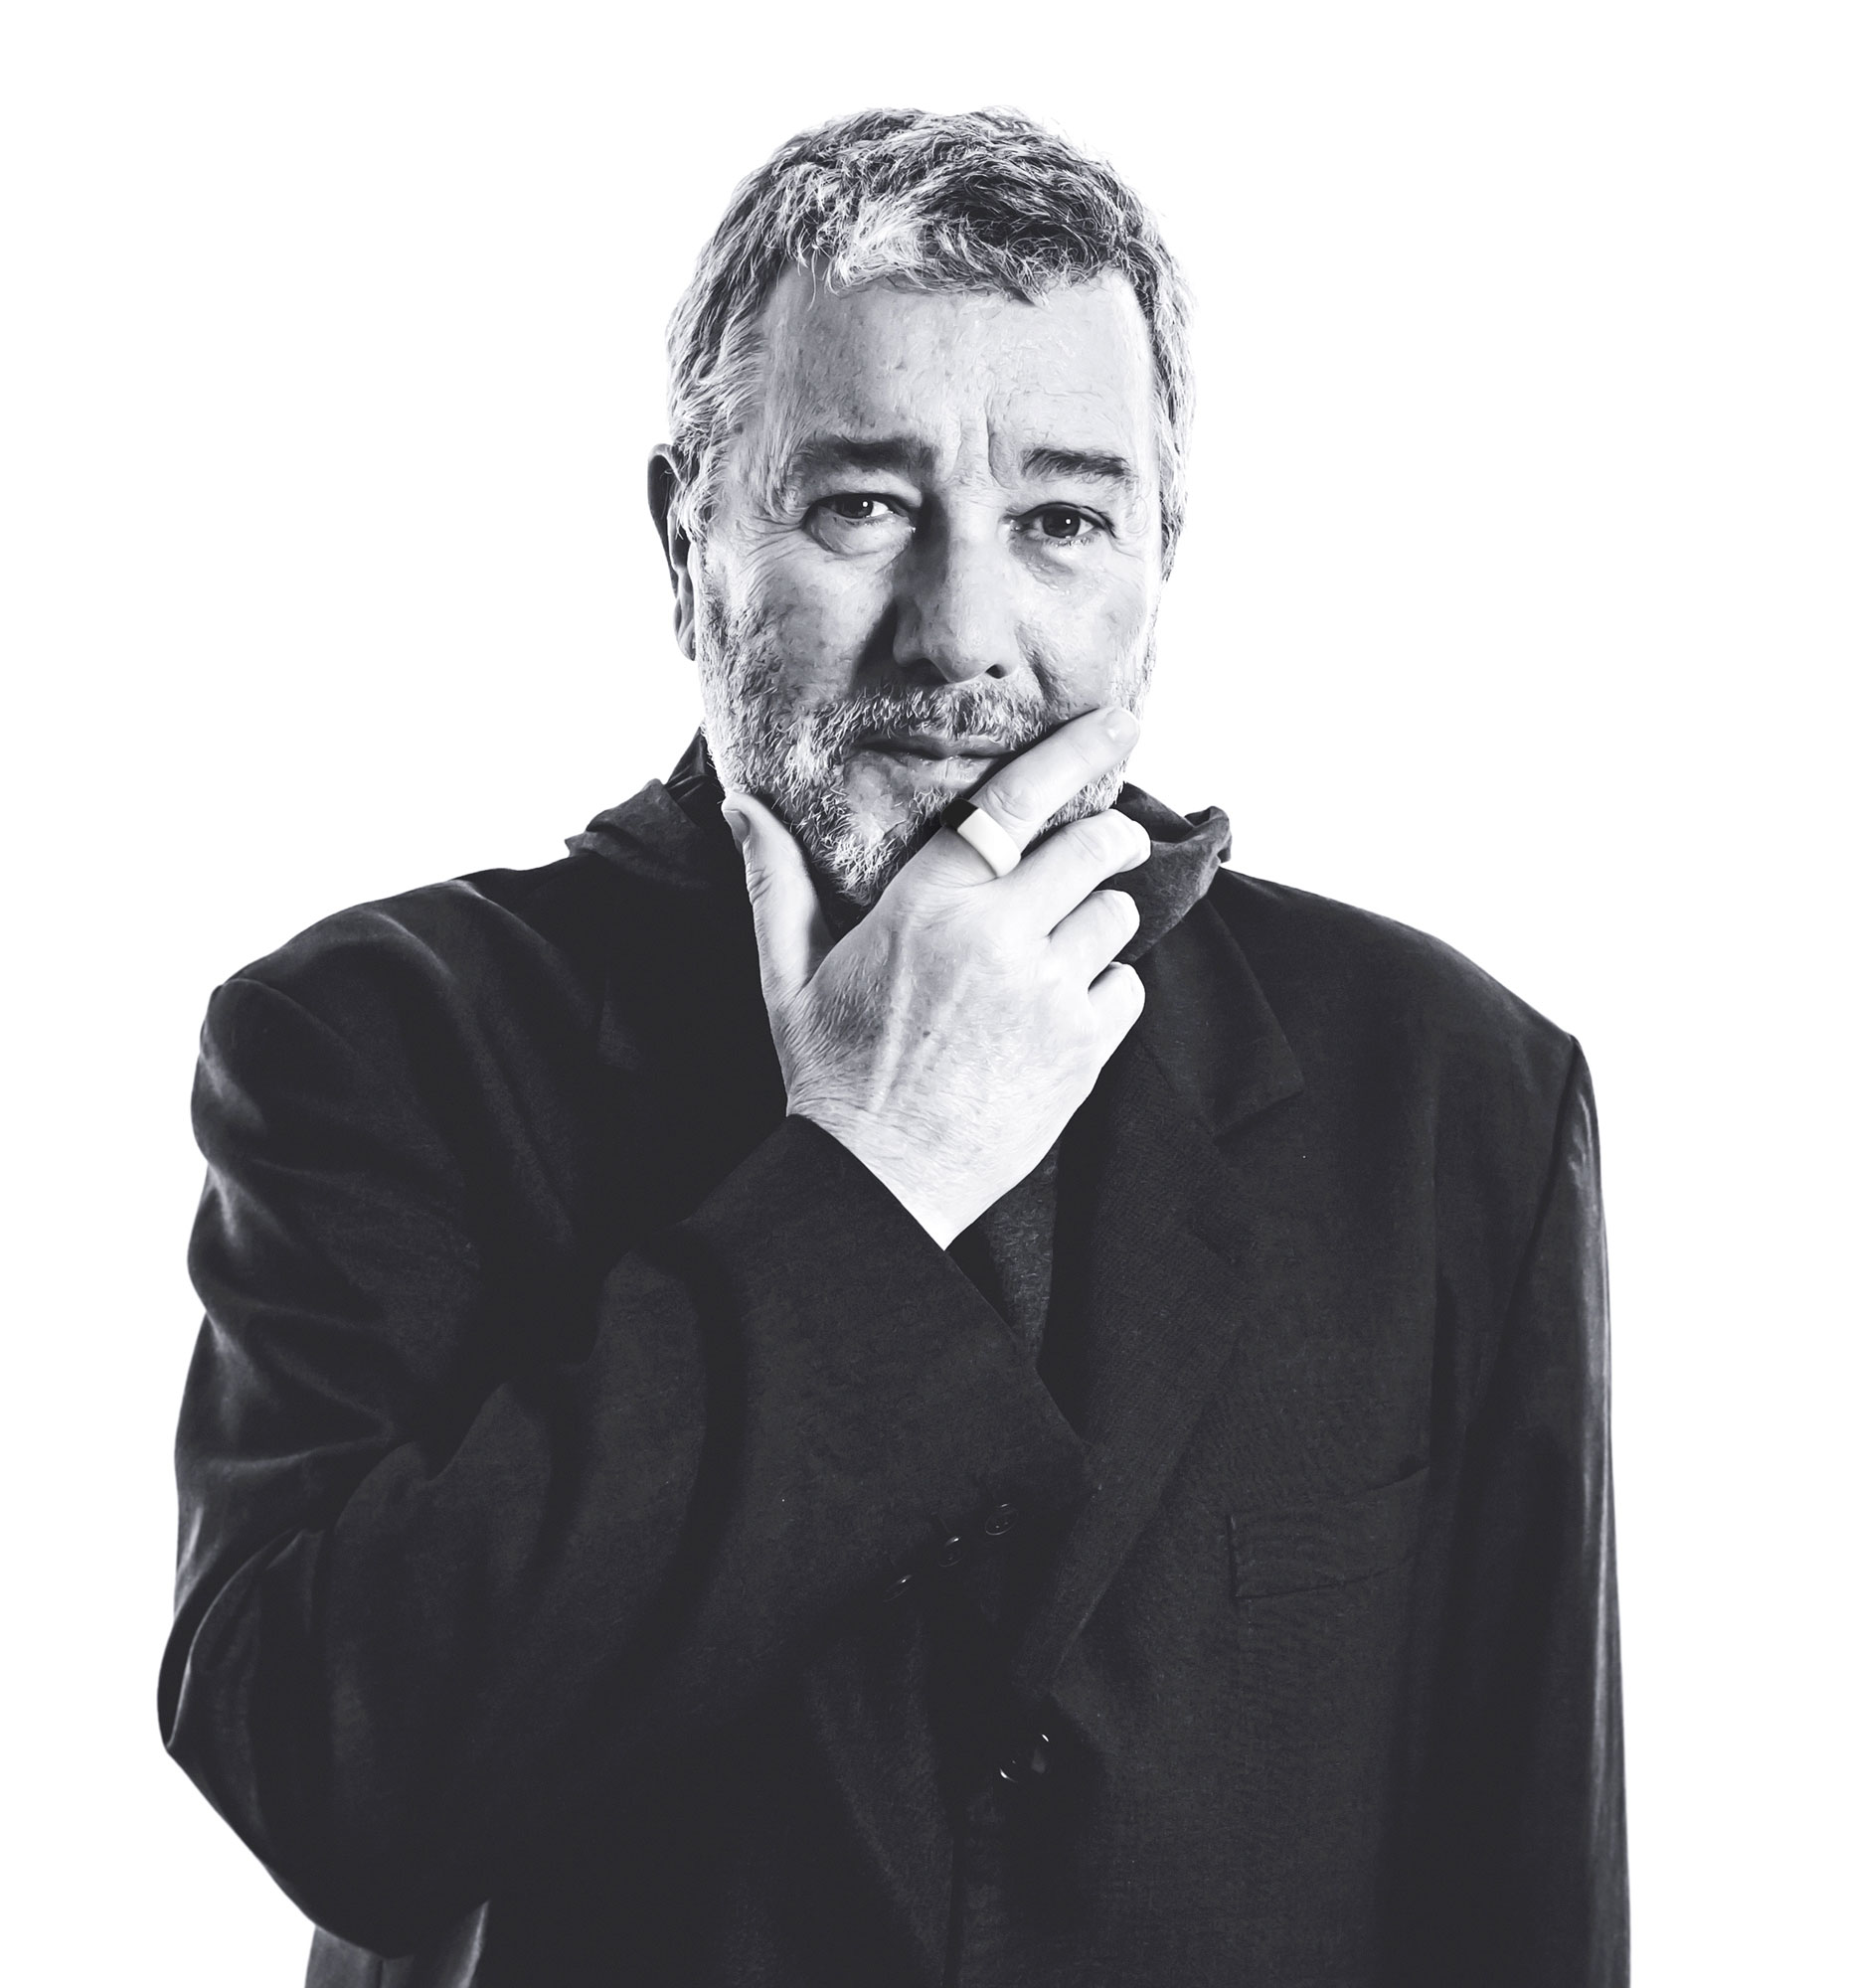 Highflyer 2000: Philippe Starck